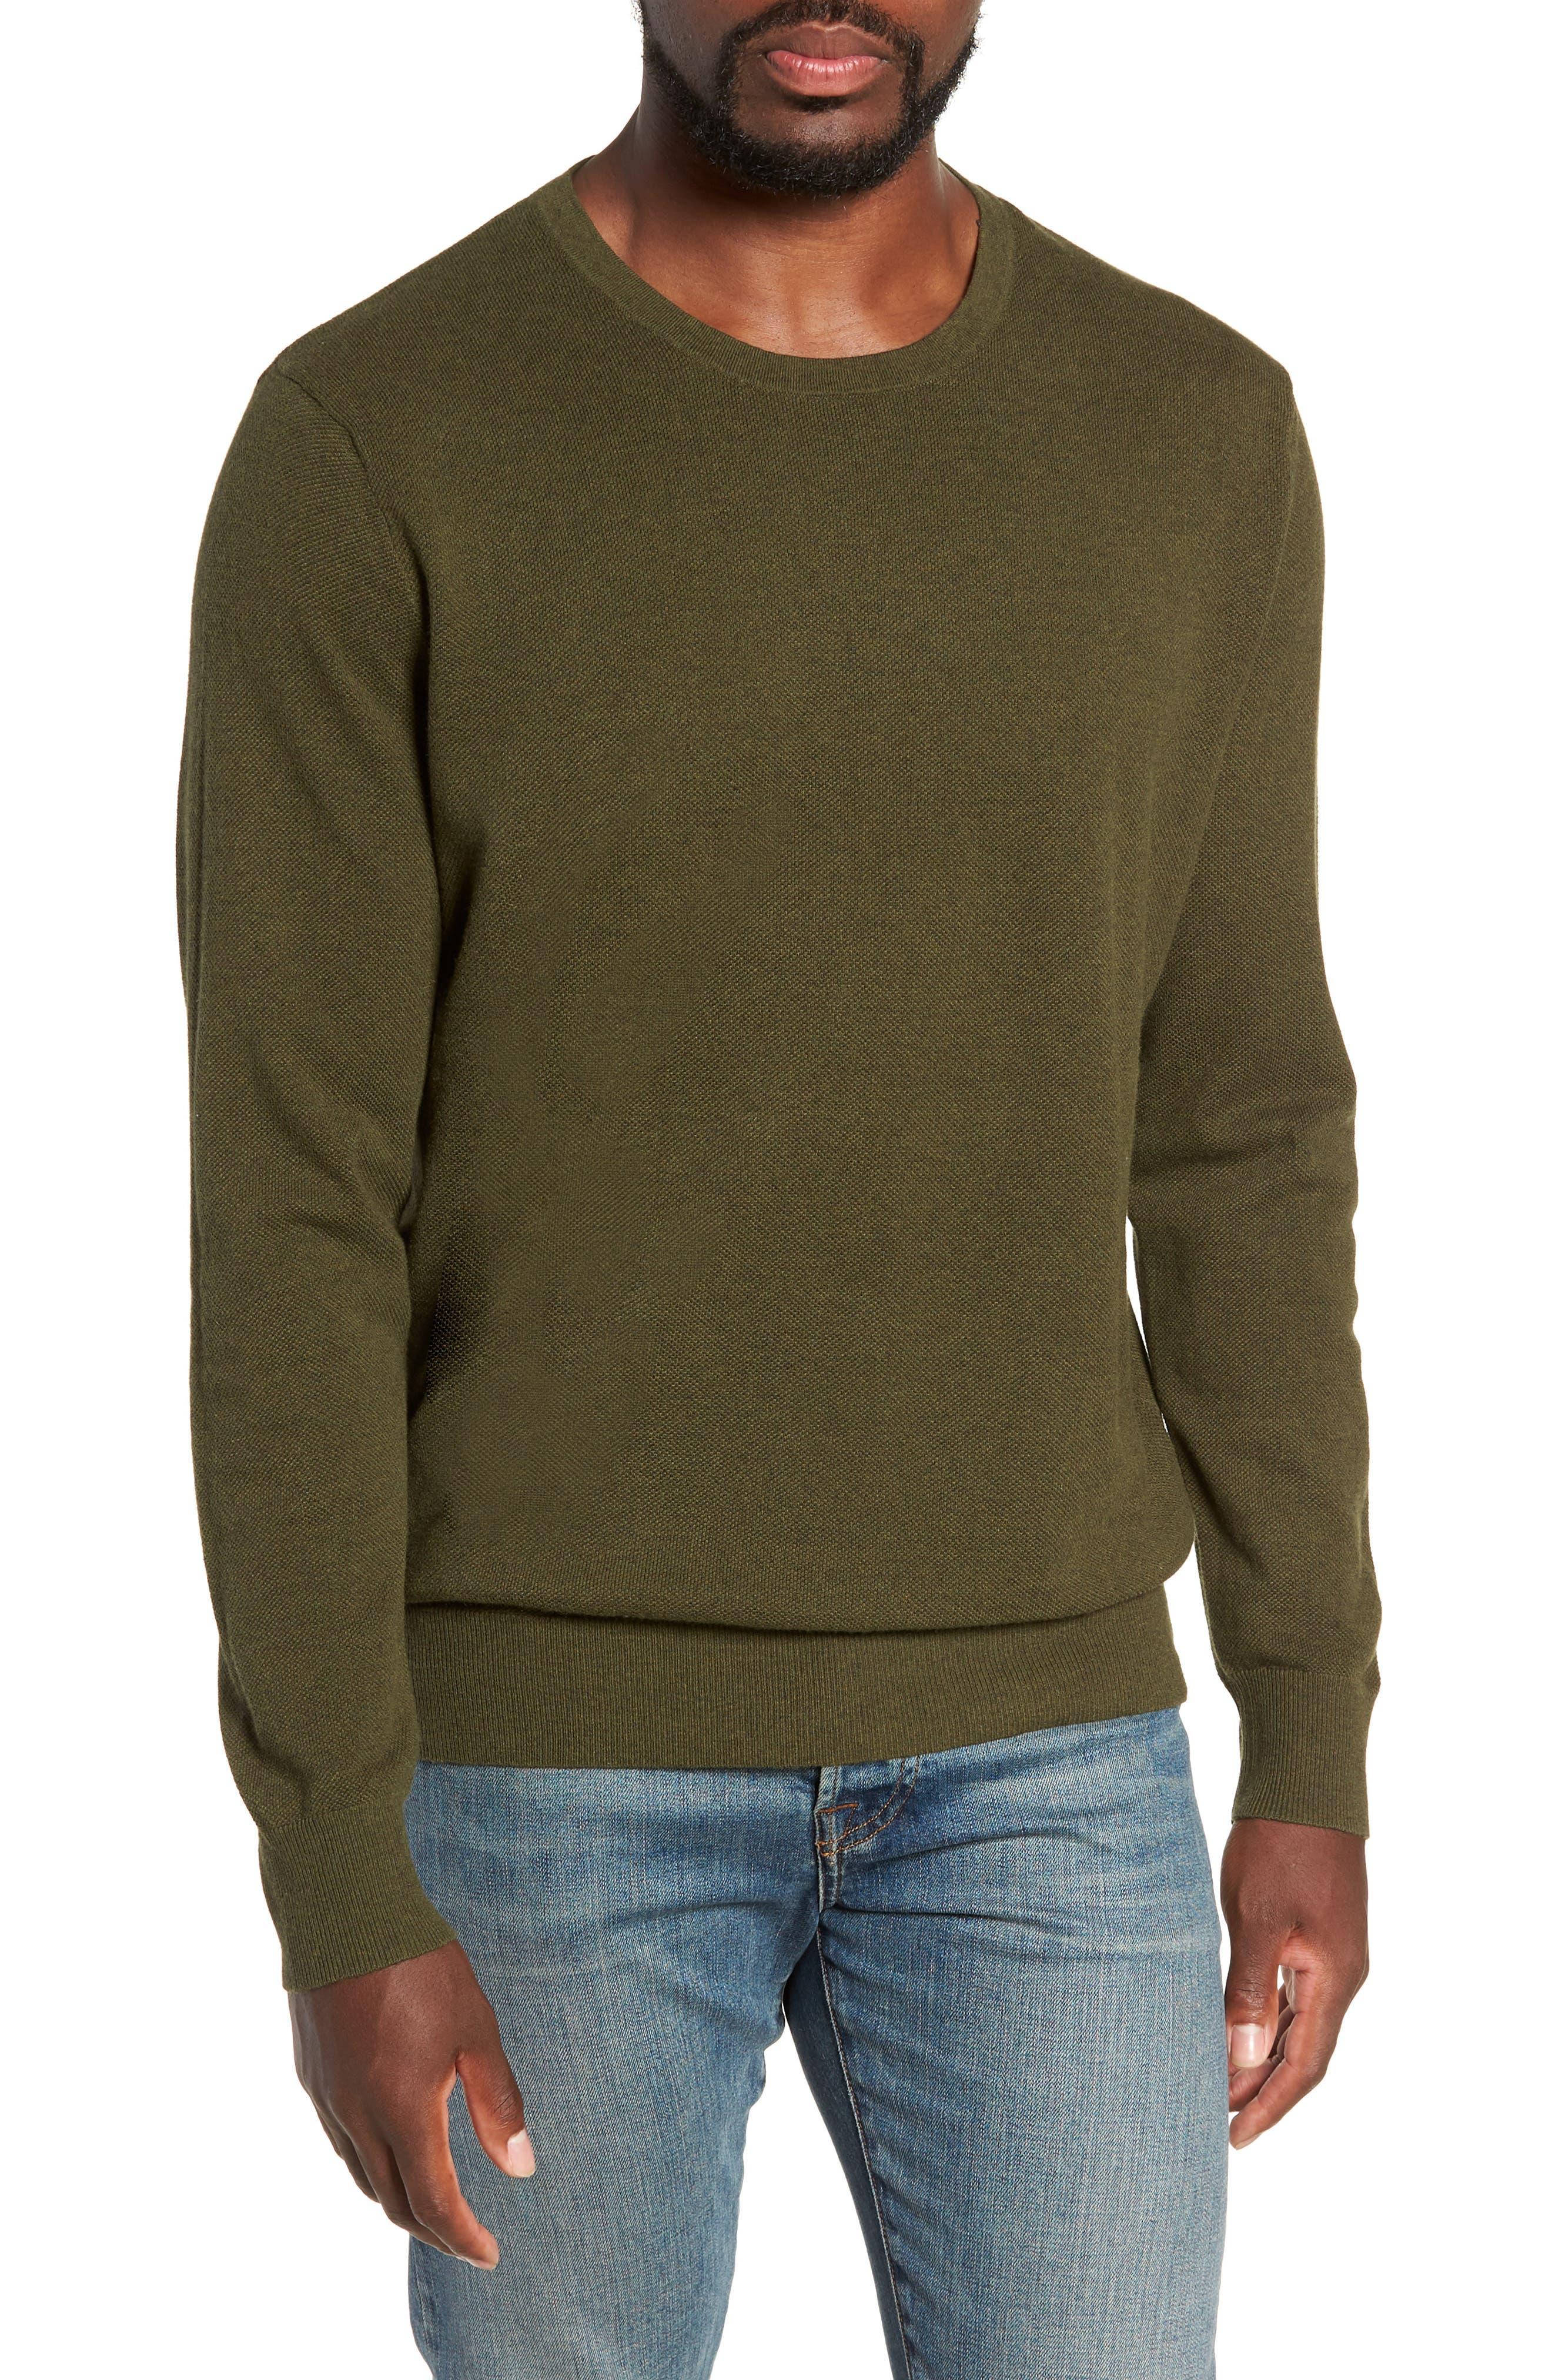 Cotton & Cashmere Piqué Crewneck Sweater,                         Main,                         color, HEATHER OLIVE